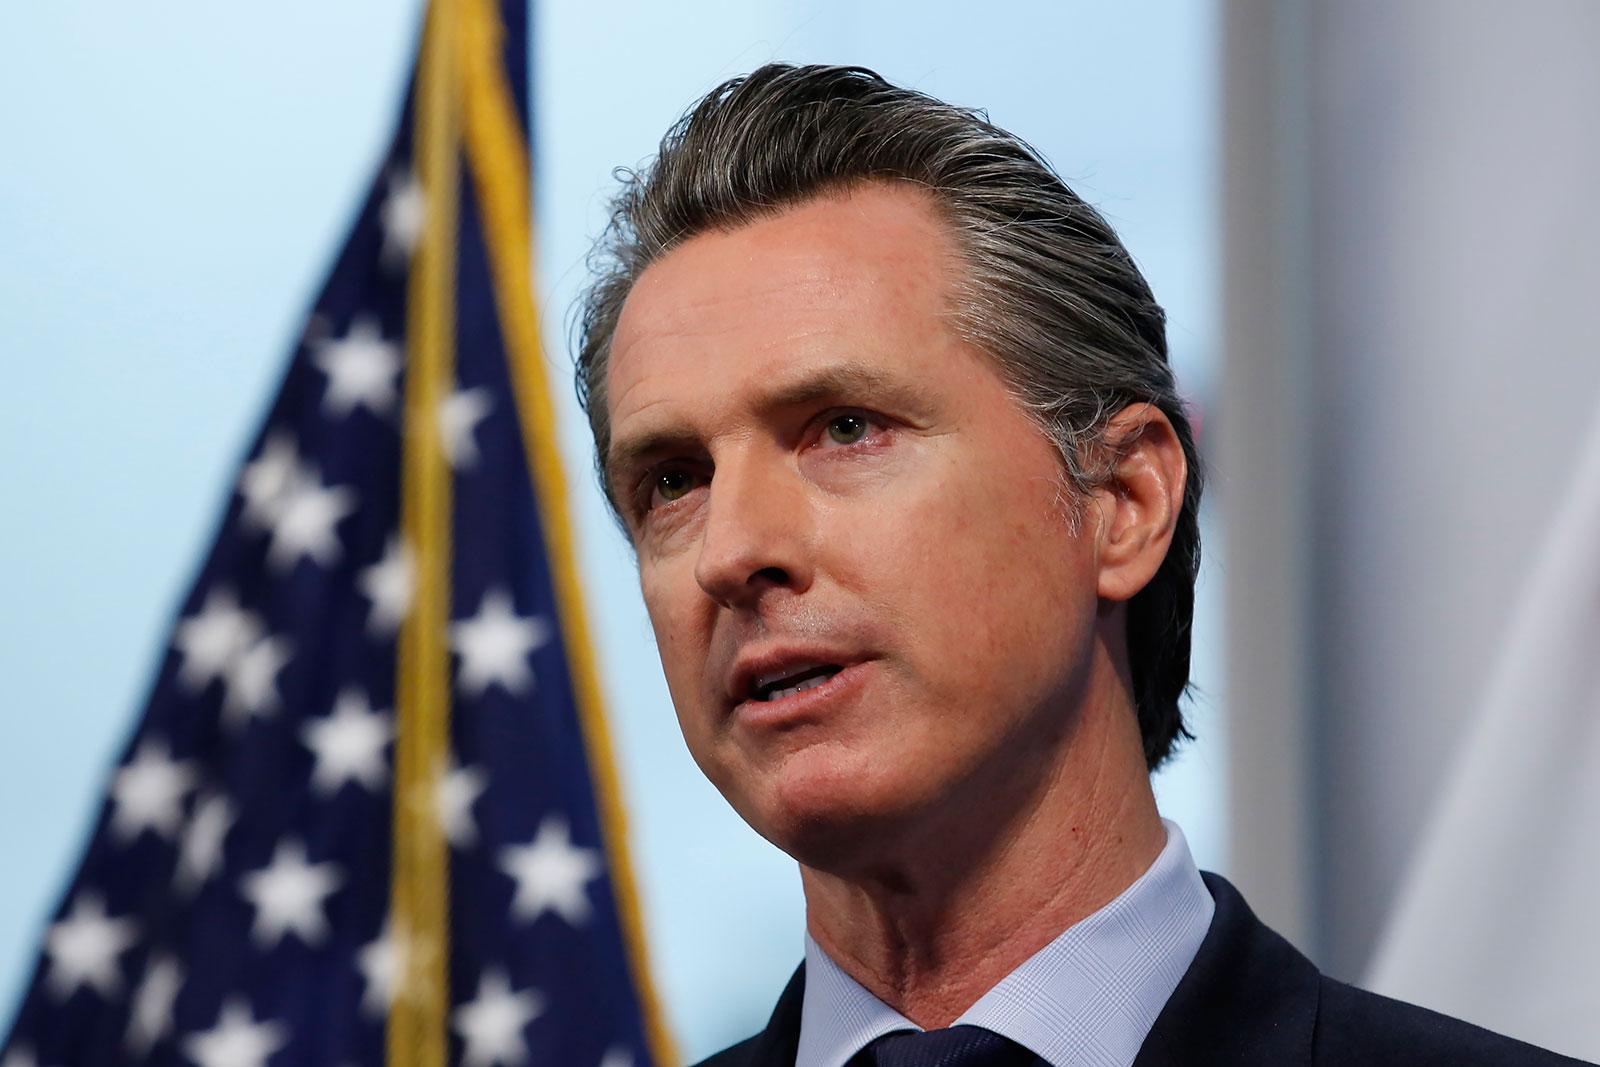 California Gov. Gavin Newsom speaks at a news briefing in Rancho Cordova, California on April 9.